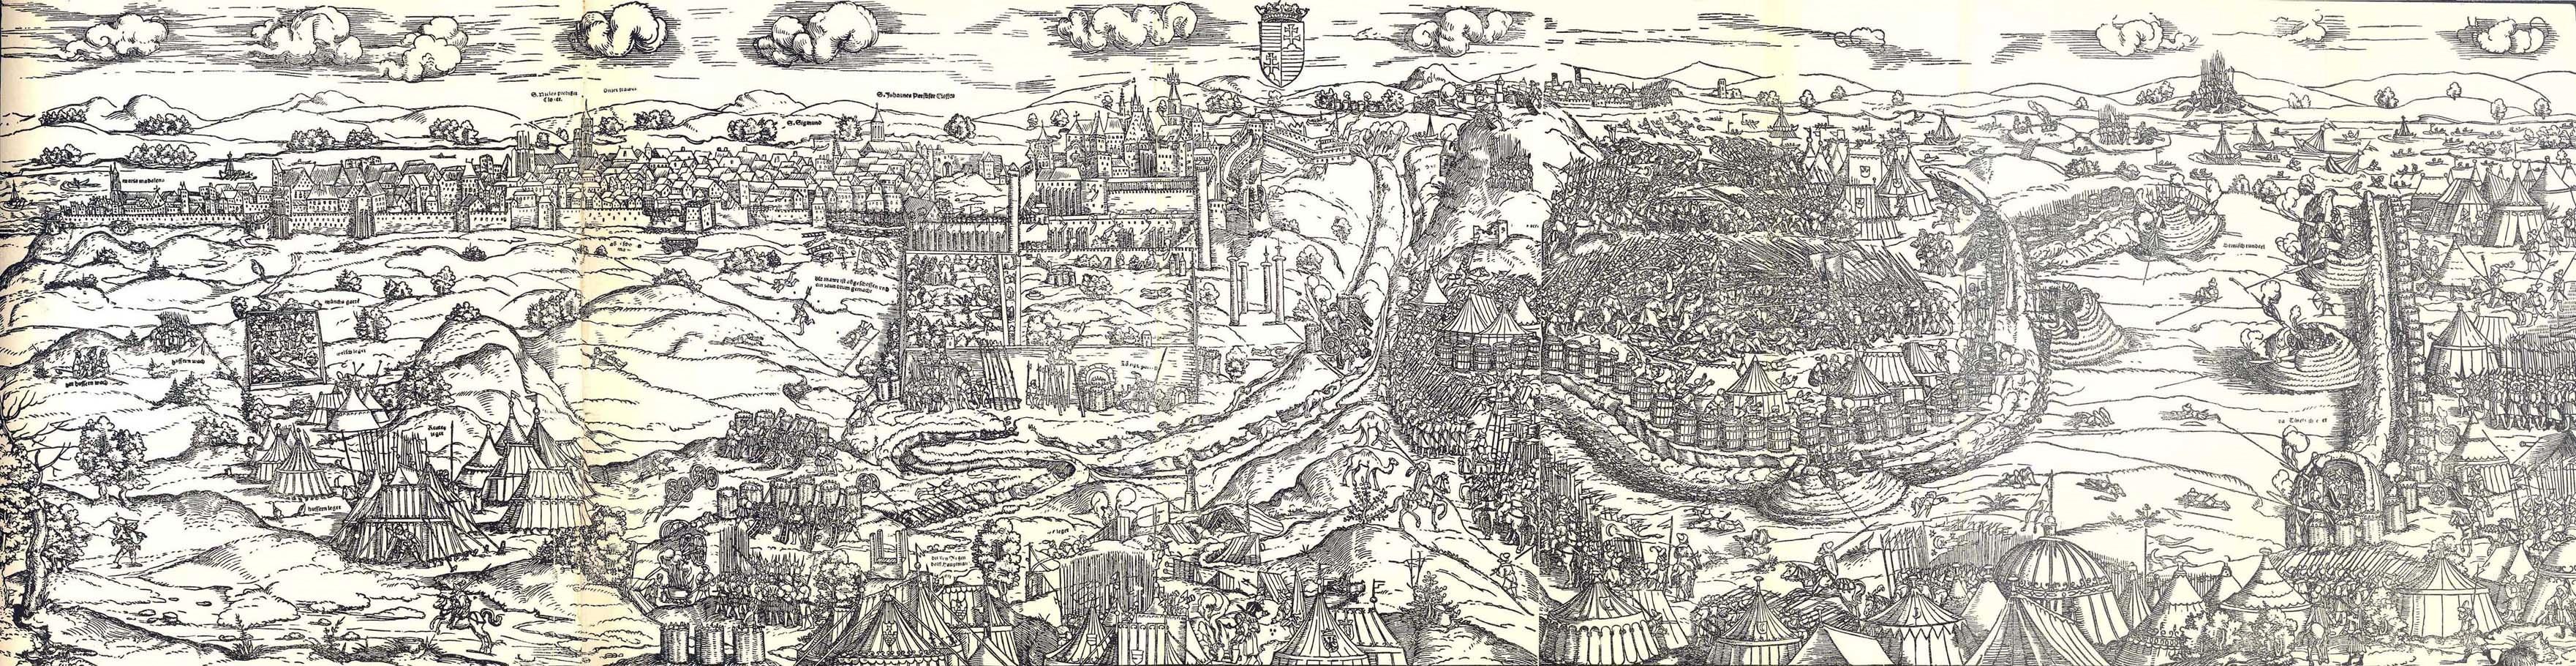 Buda_in_1541-by_Erhardt_Schön_from_1542